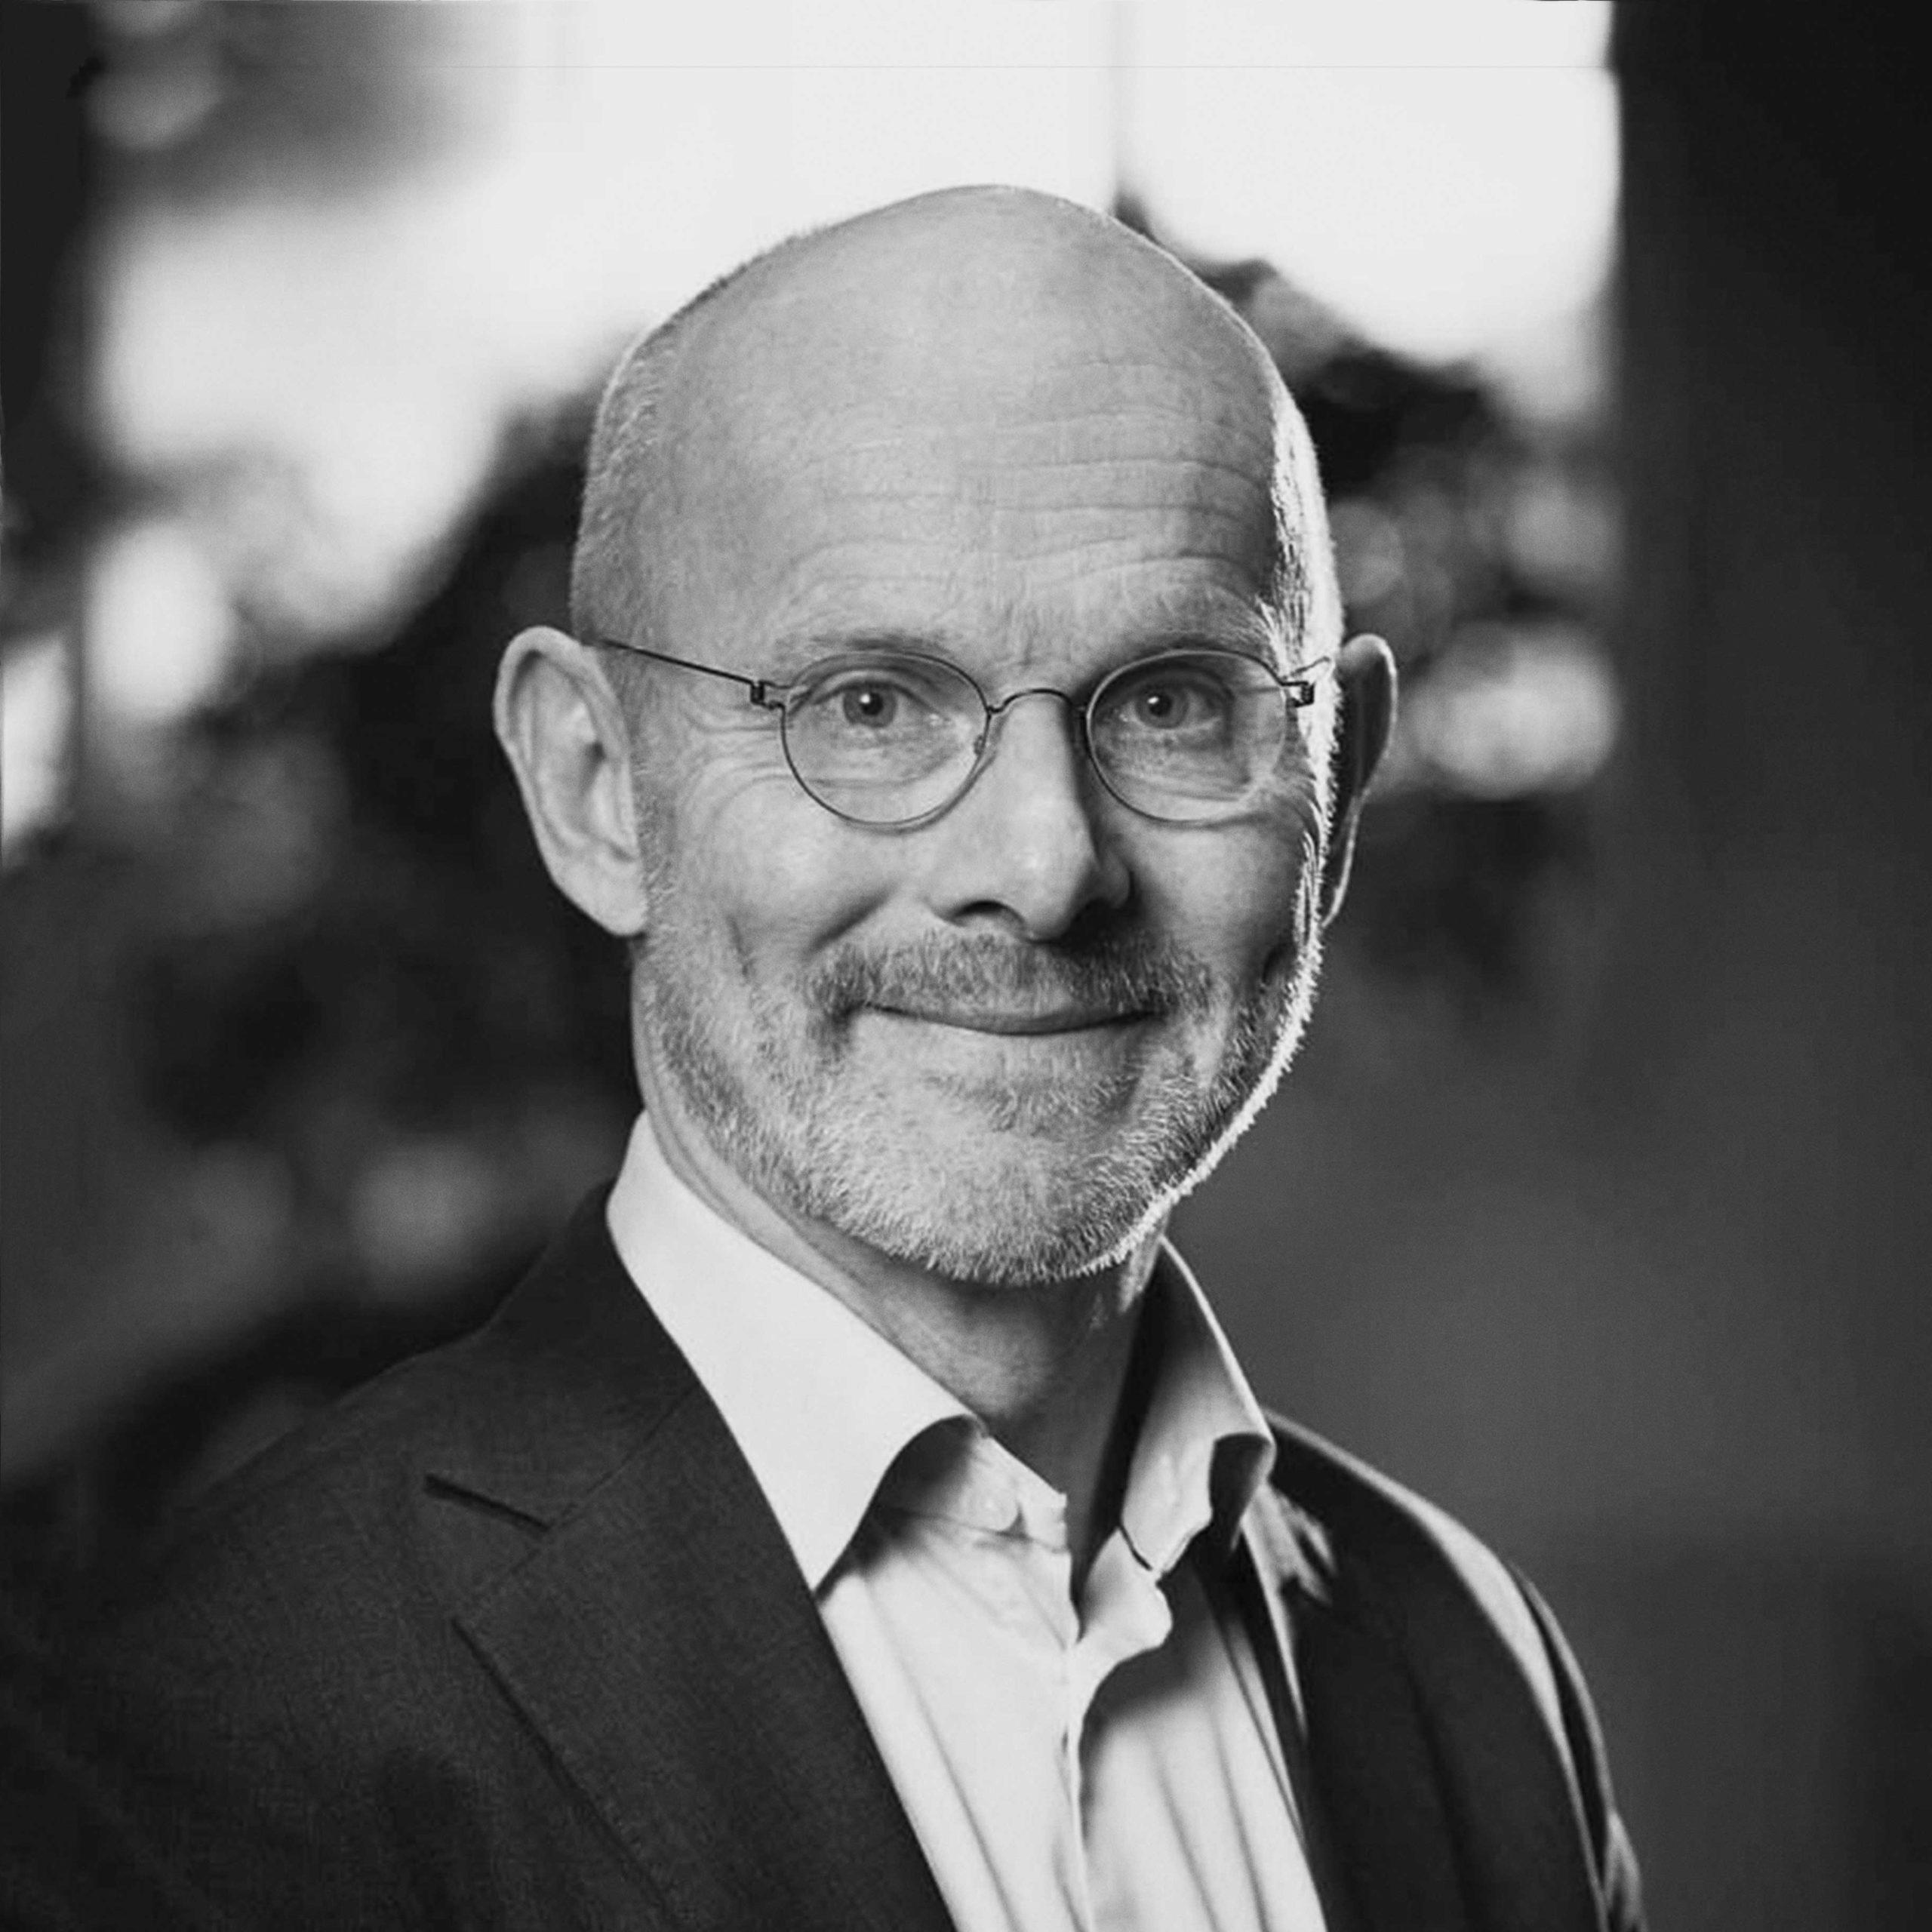 Eir Ventures Magnus Persson portrait BW